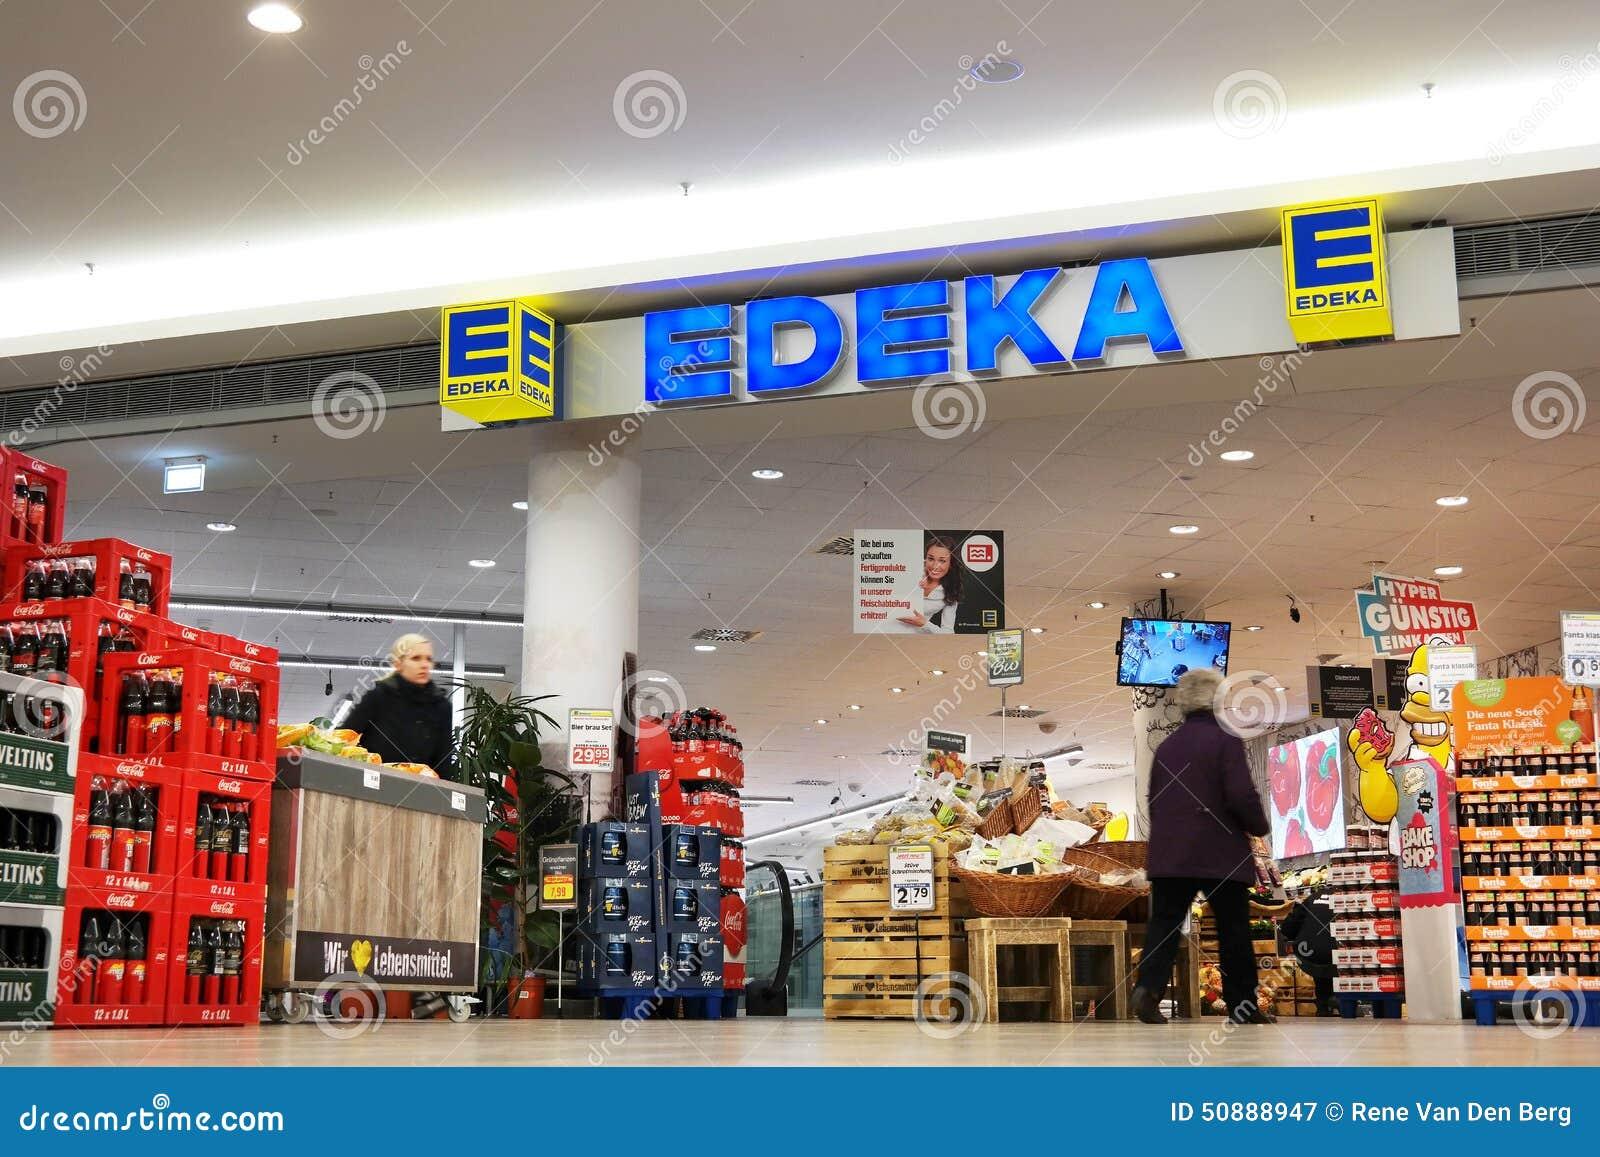 M Bel Brand Meppen edeka supermarket editorial photography image of edeka 50888947